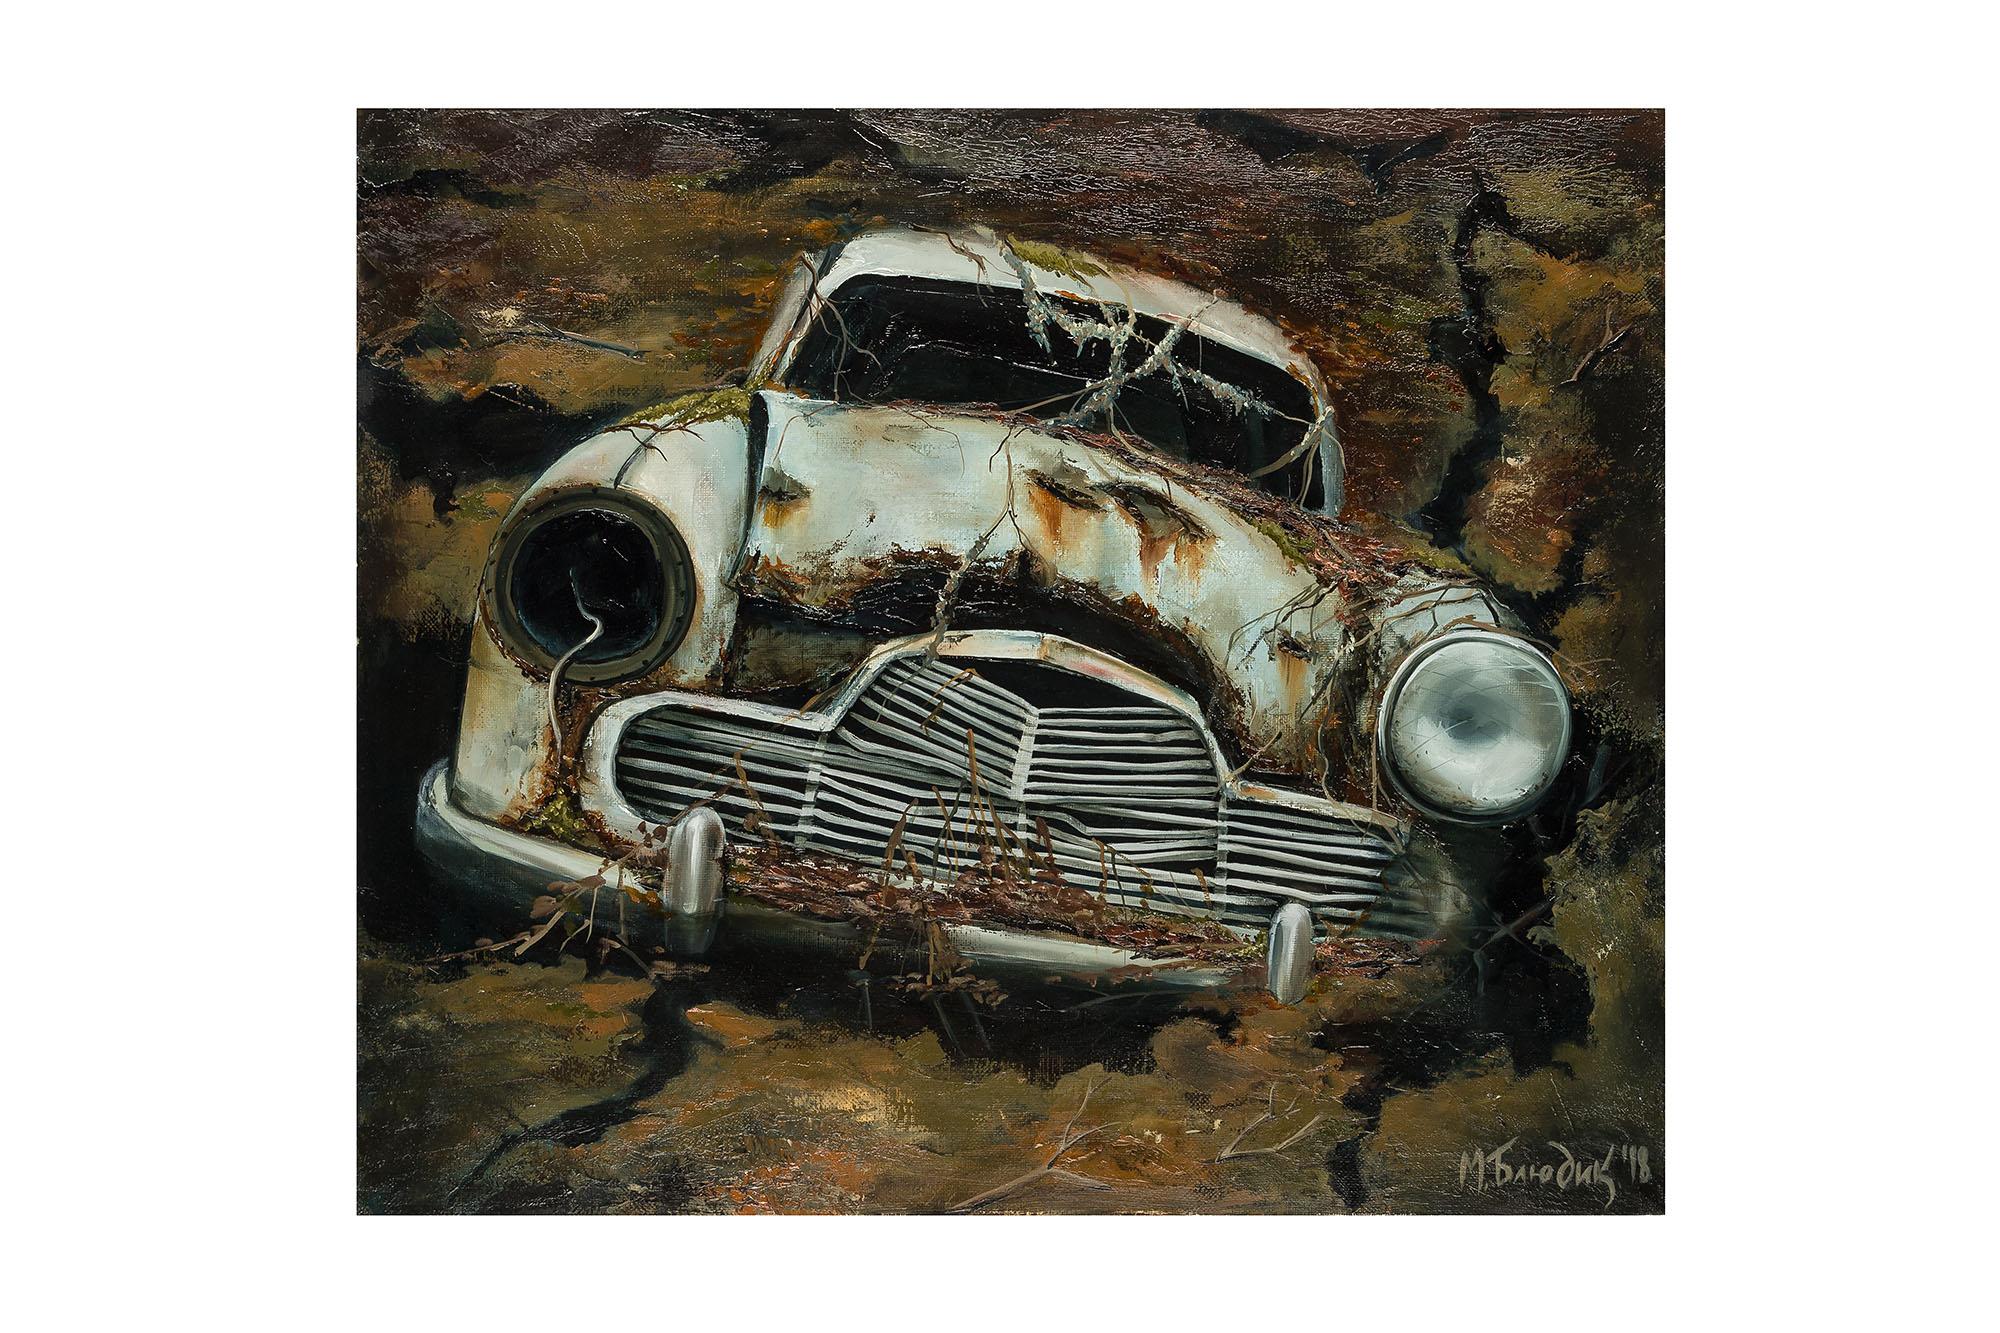 Undina artwork by Mariia Bliudik - art listed for sale on Artplode